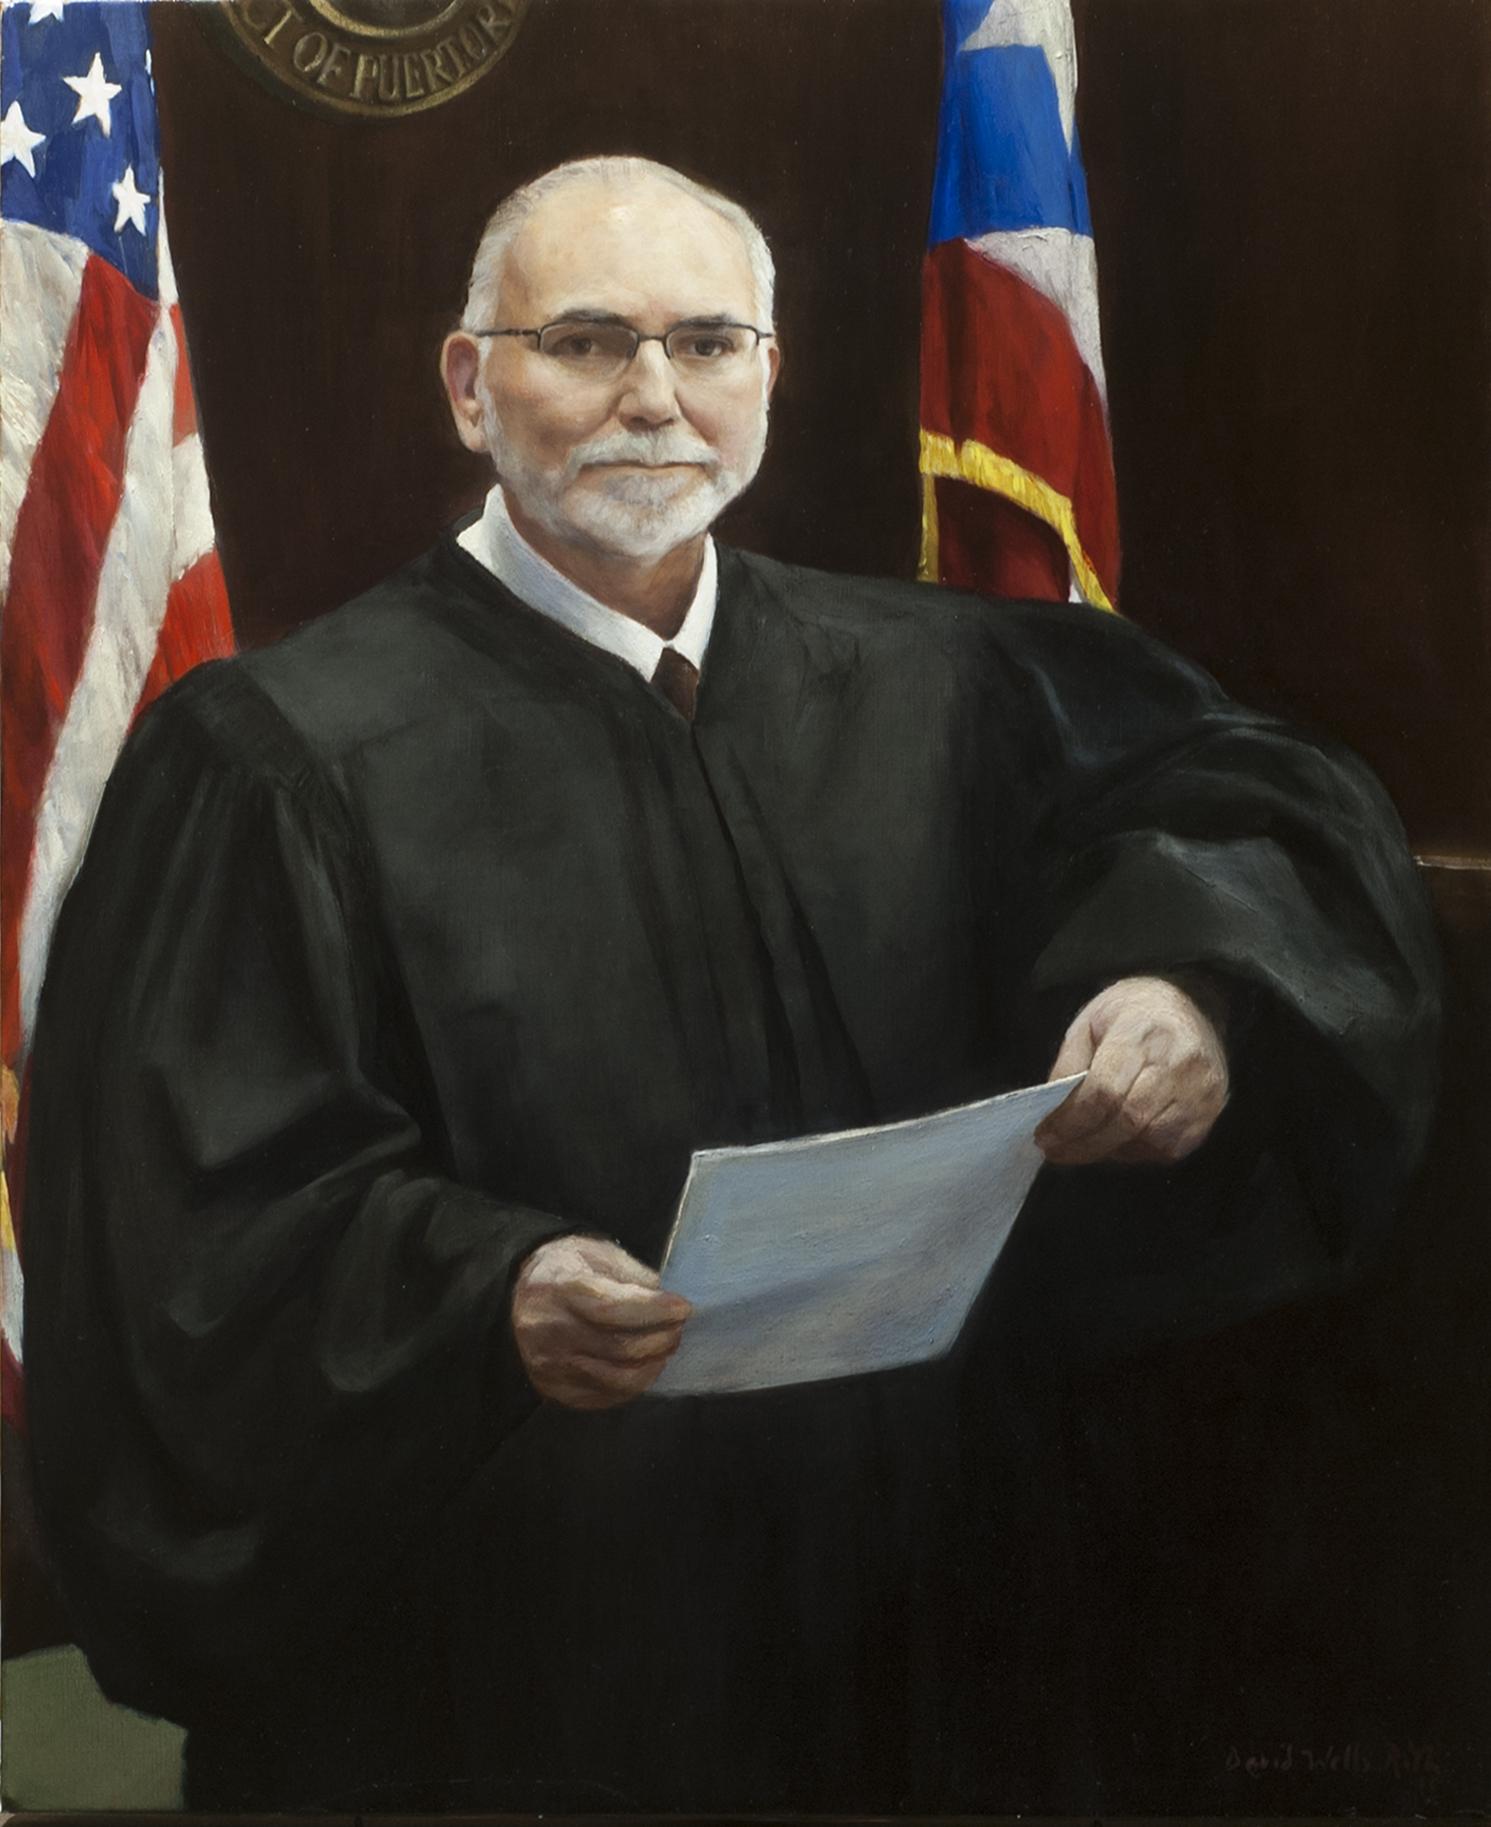 Hon. PEDRO DELGADO, United States Federal Court, Puerto Rico